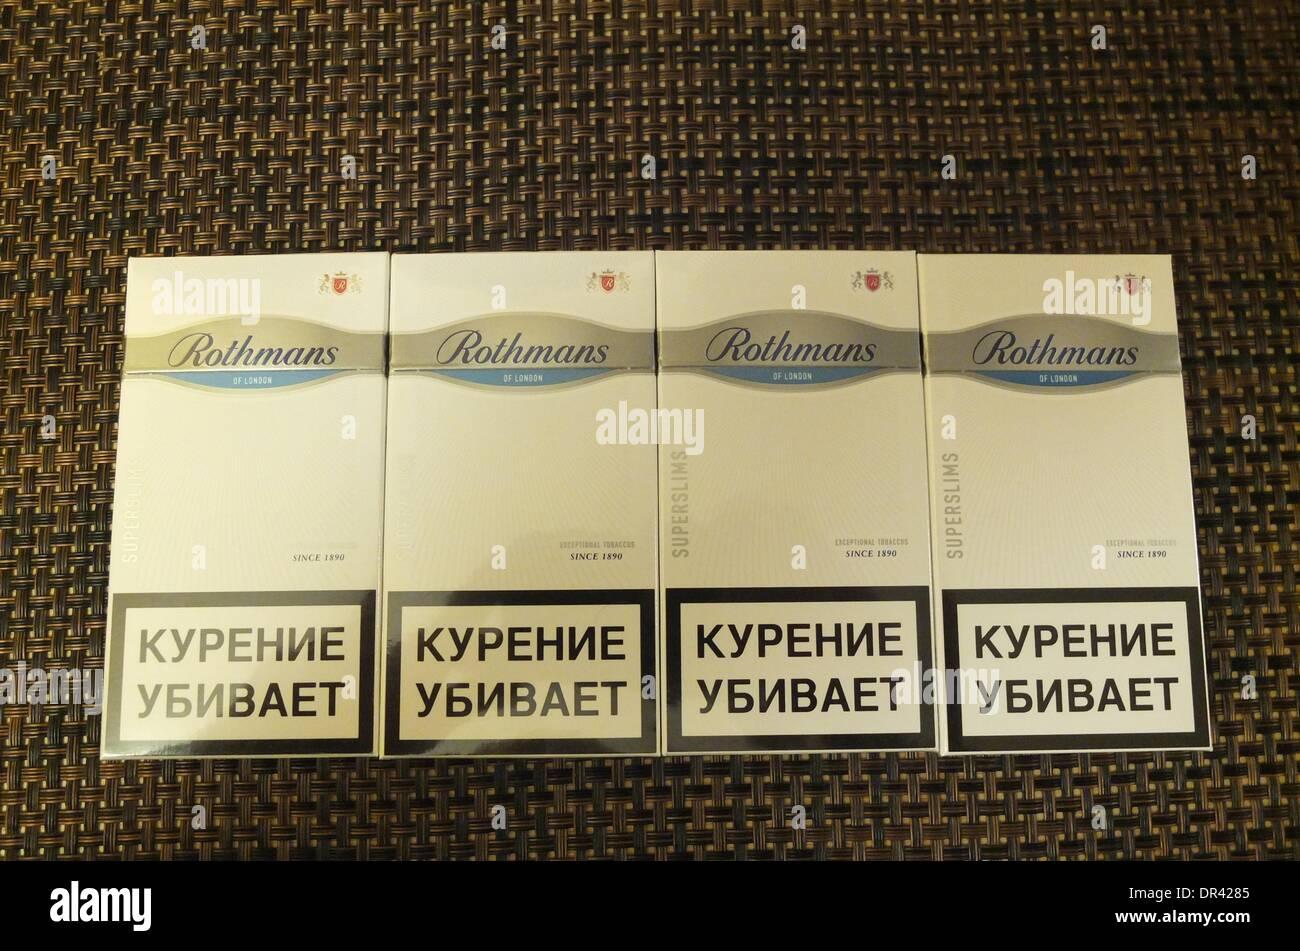 Rothmans cigarette types